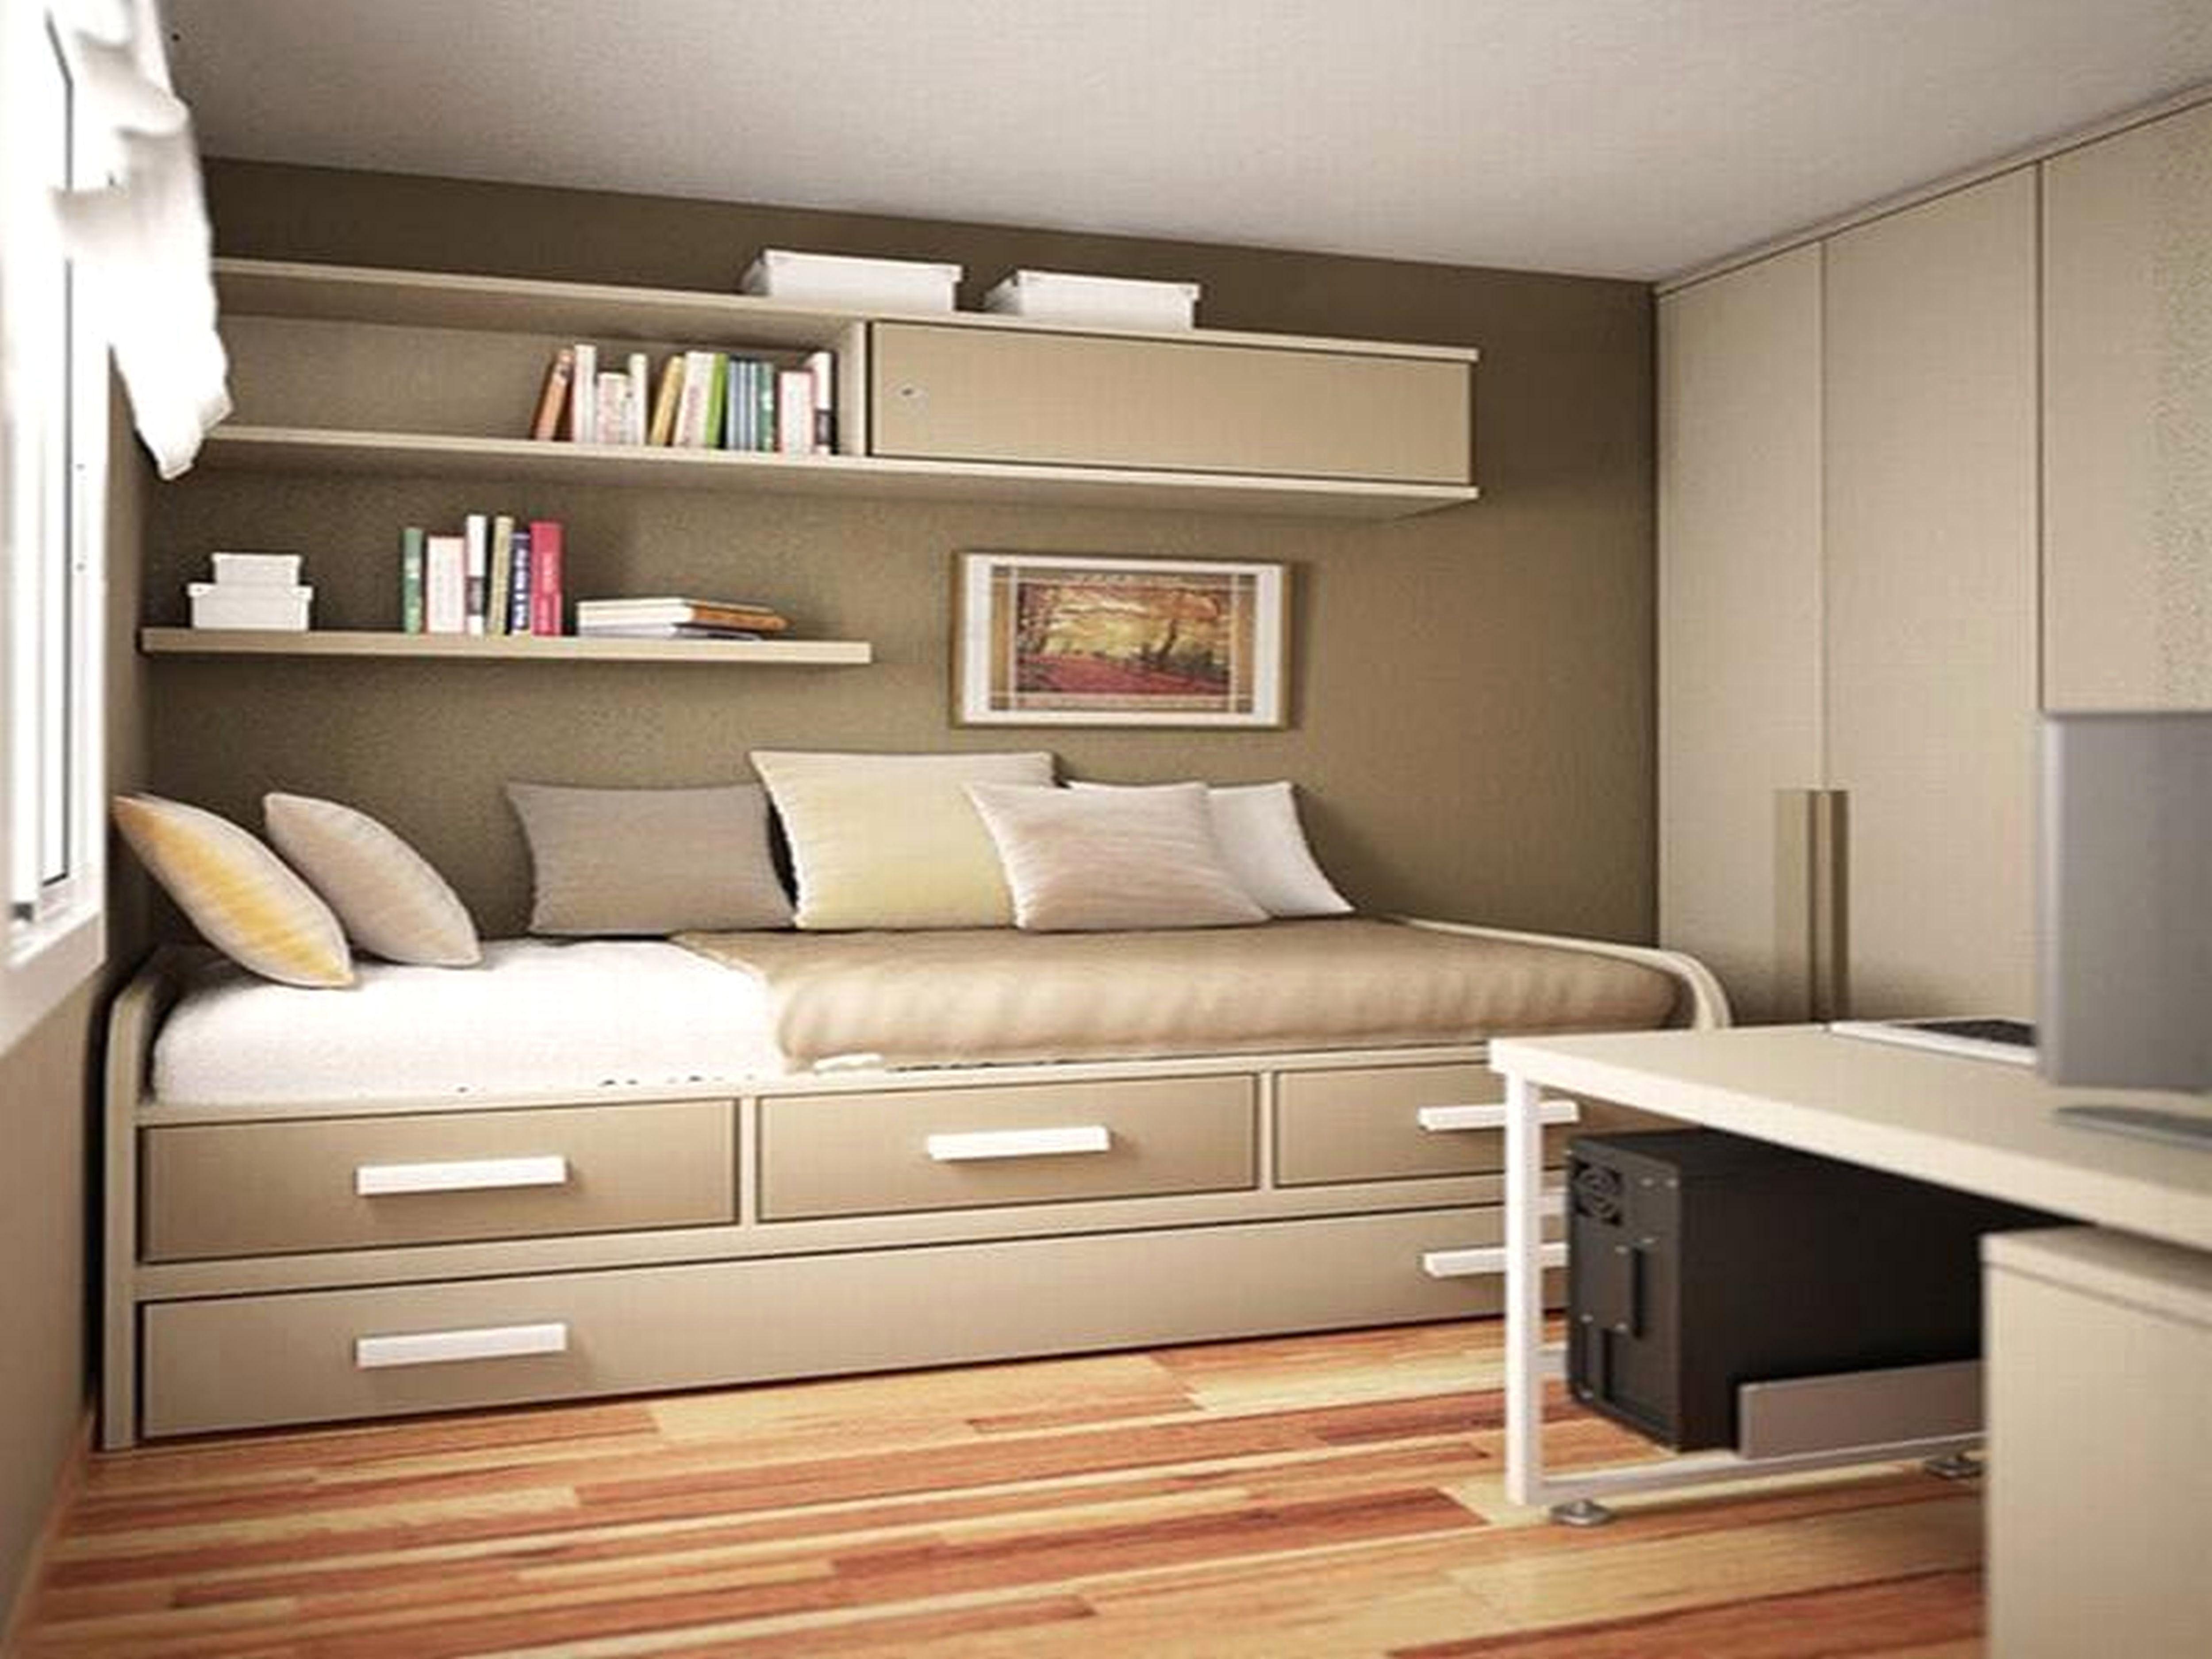 Small Bedroom Single Bed Ideas  Small bedroom storage, Small room